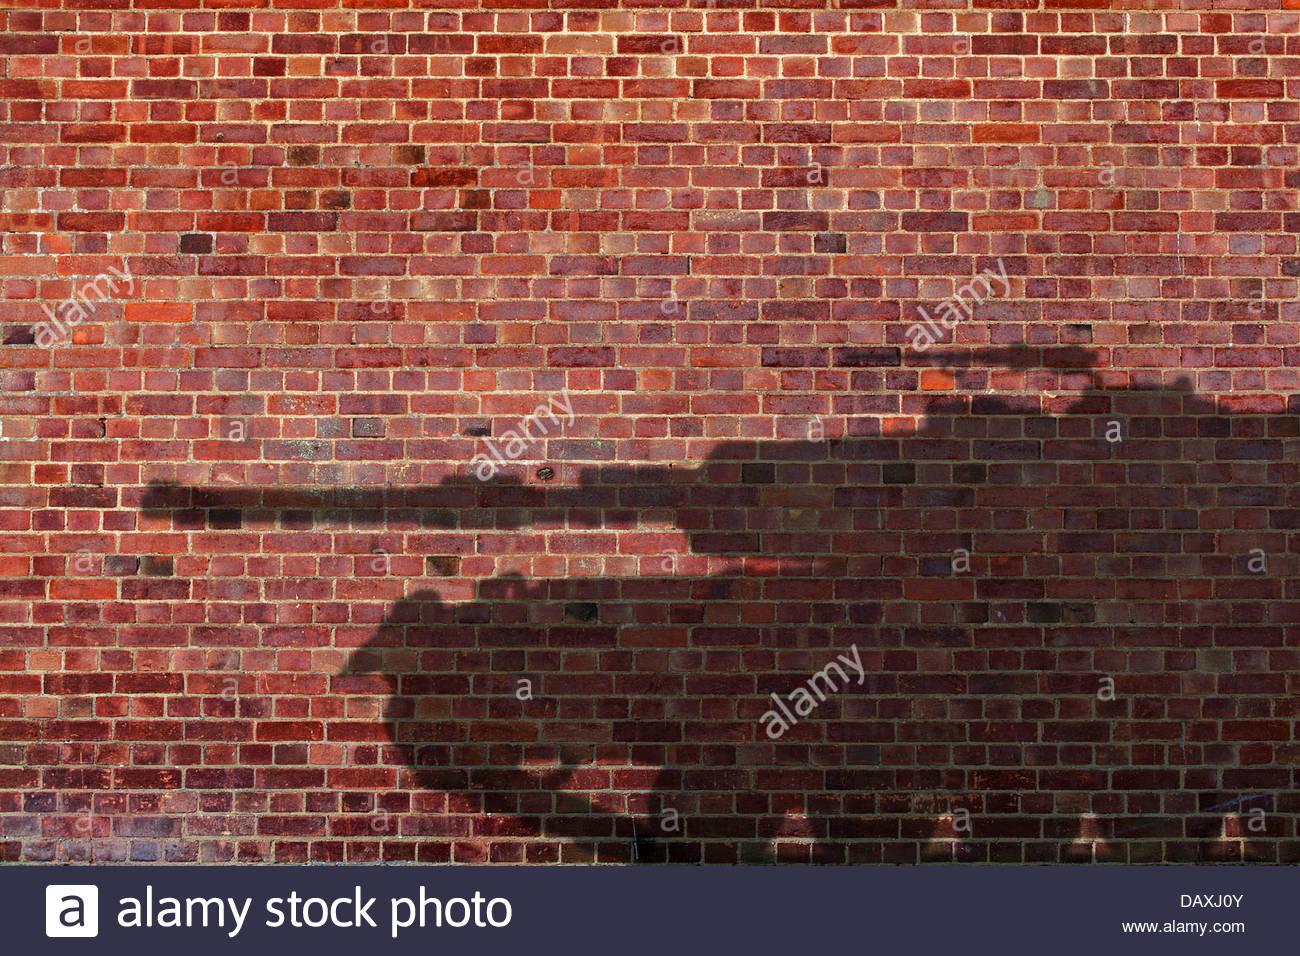 tank shadow - Stock Image